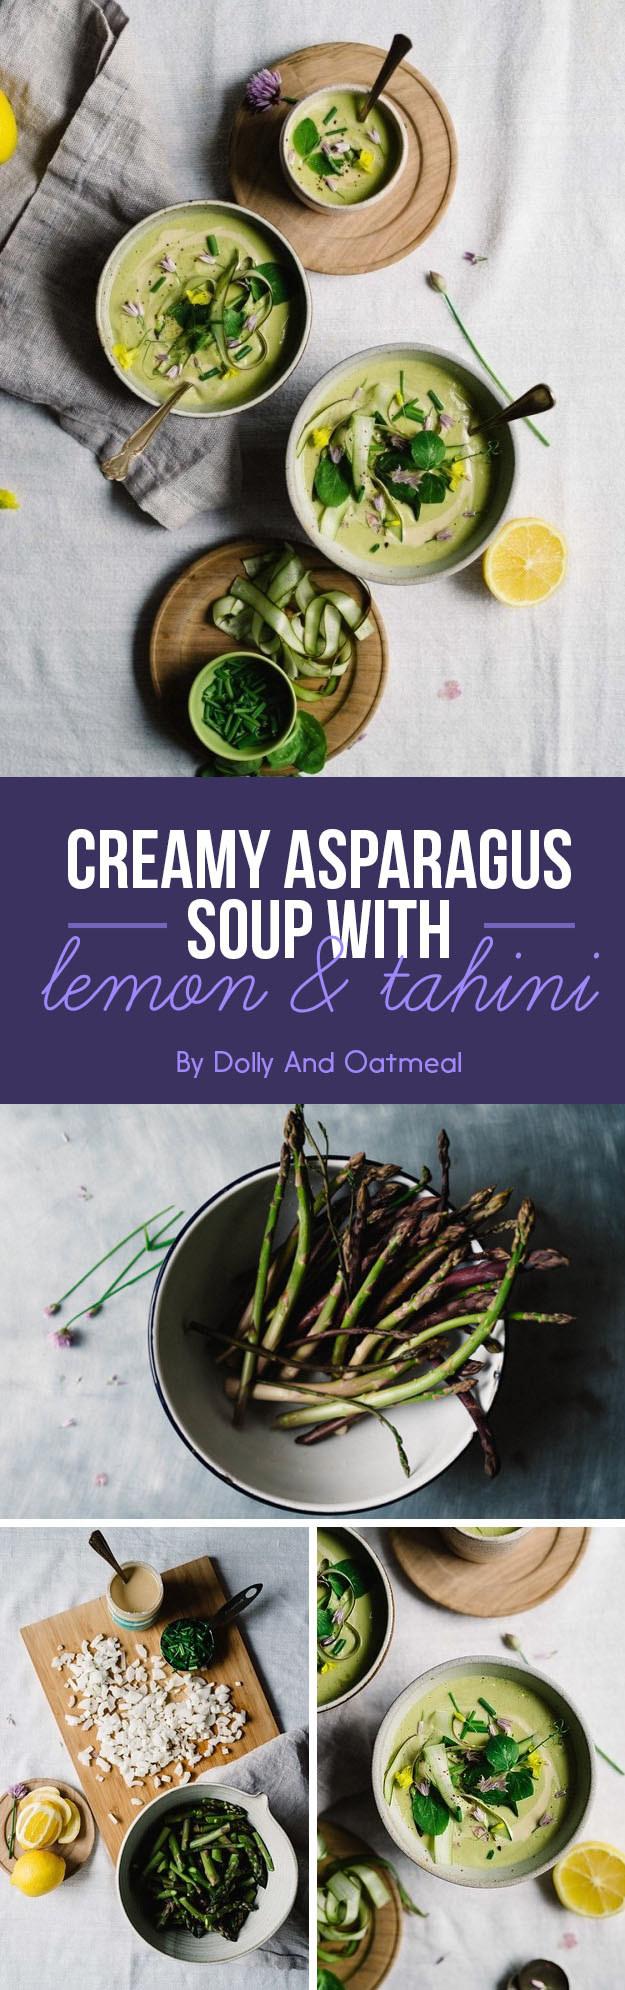 Creamy Asparagus Soup with Lemon and Tahini